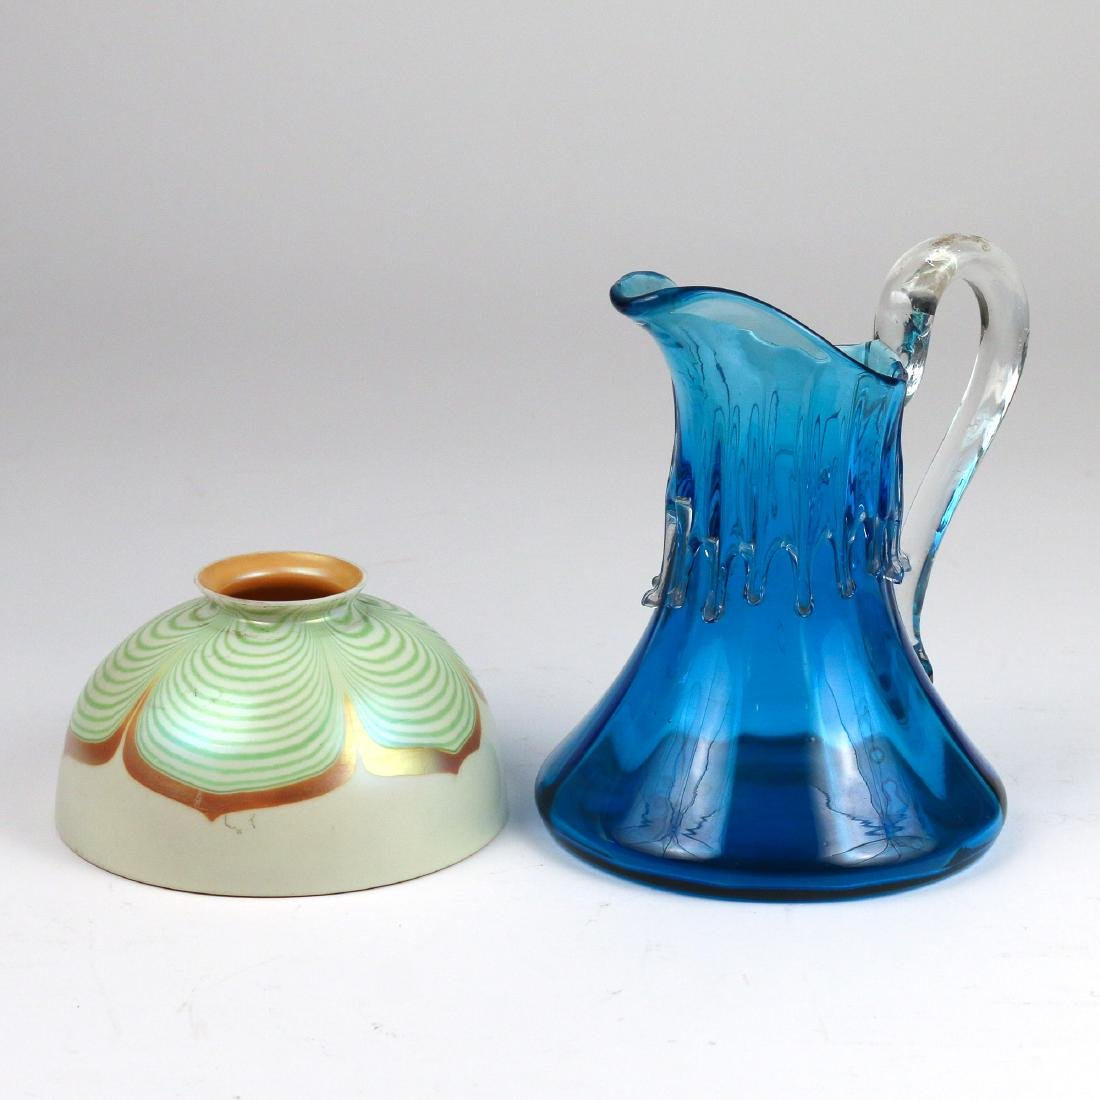 (2pc) STEUBEN SHADE & HAND-BLOWN GLASS PITCHER